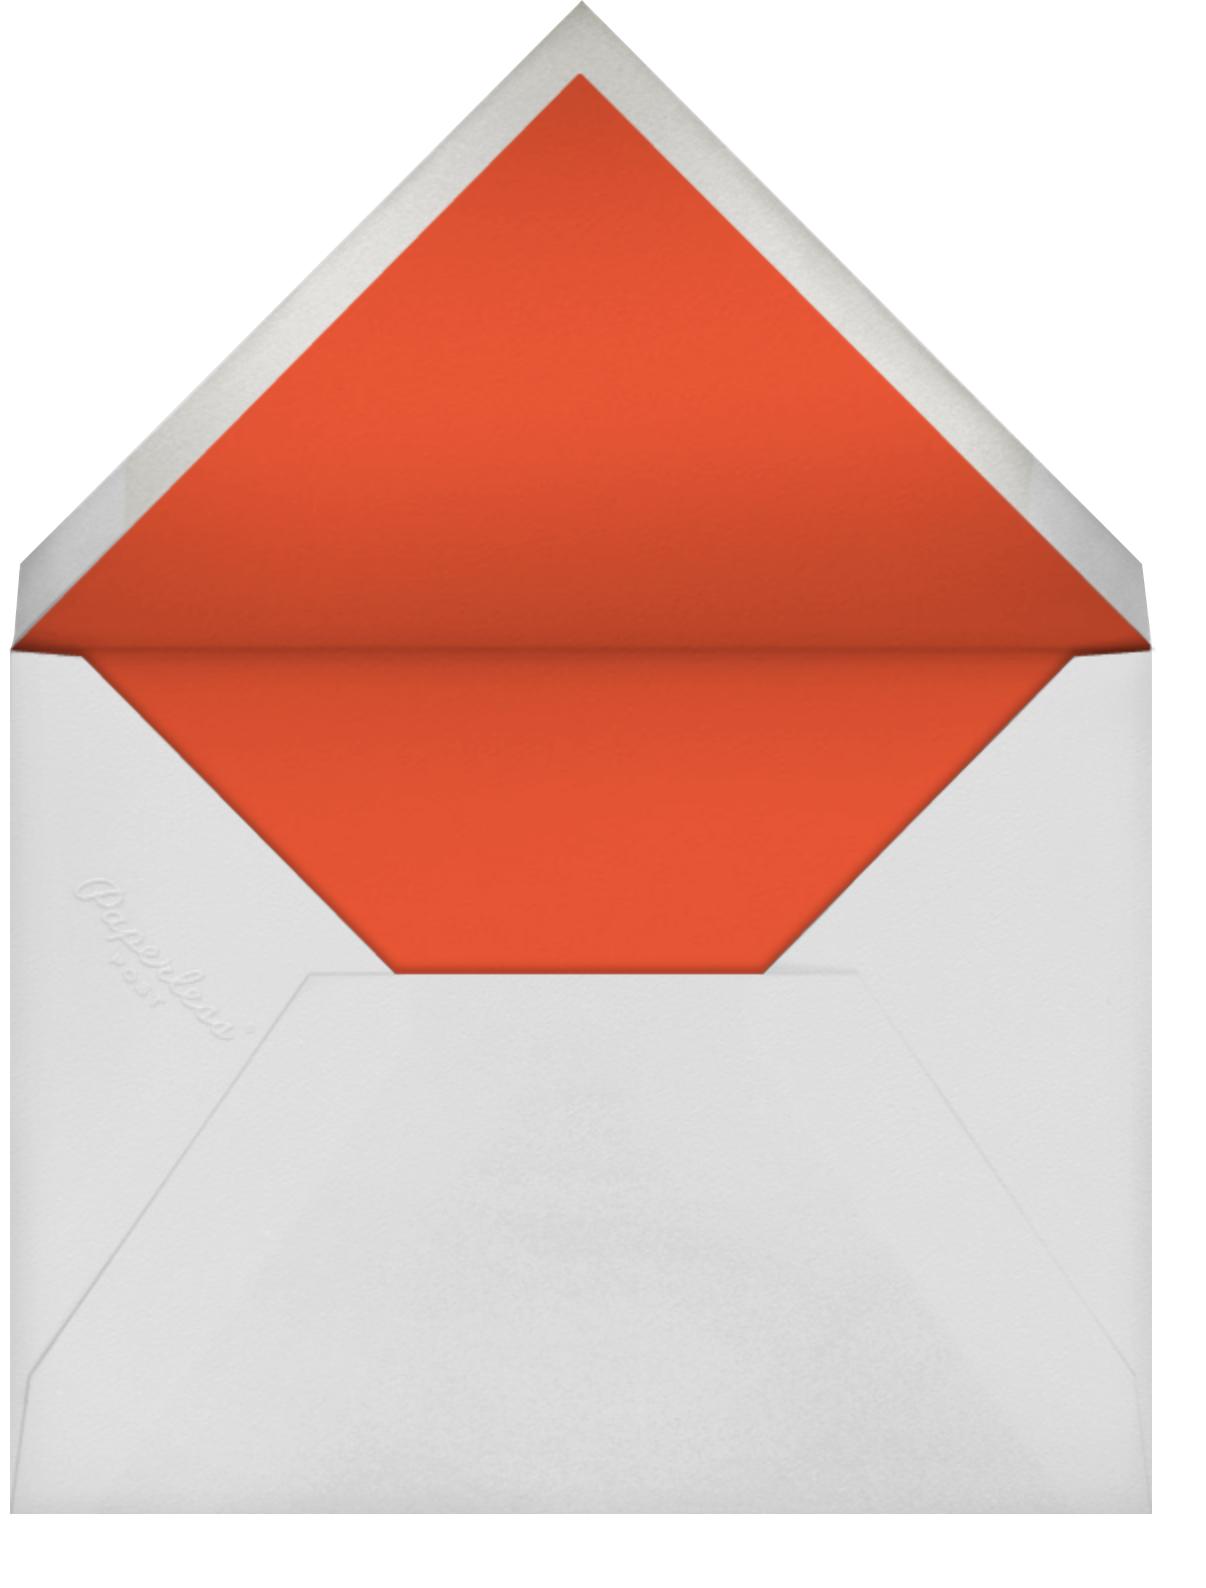 Taivaankukat - Marimekko - Casual entertaining - envelope back